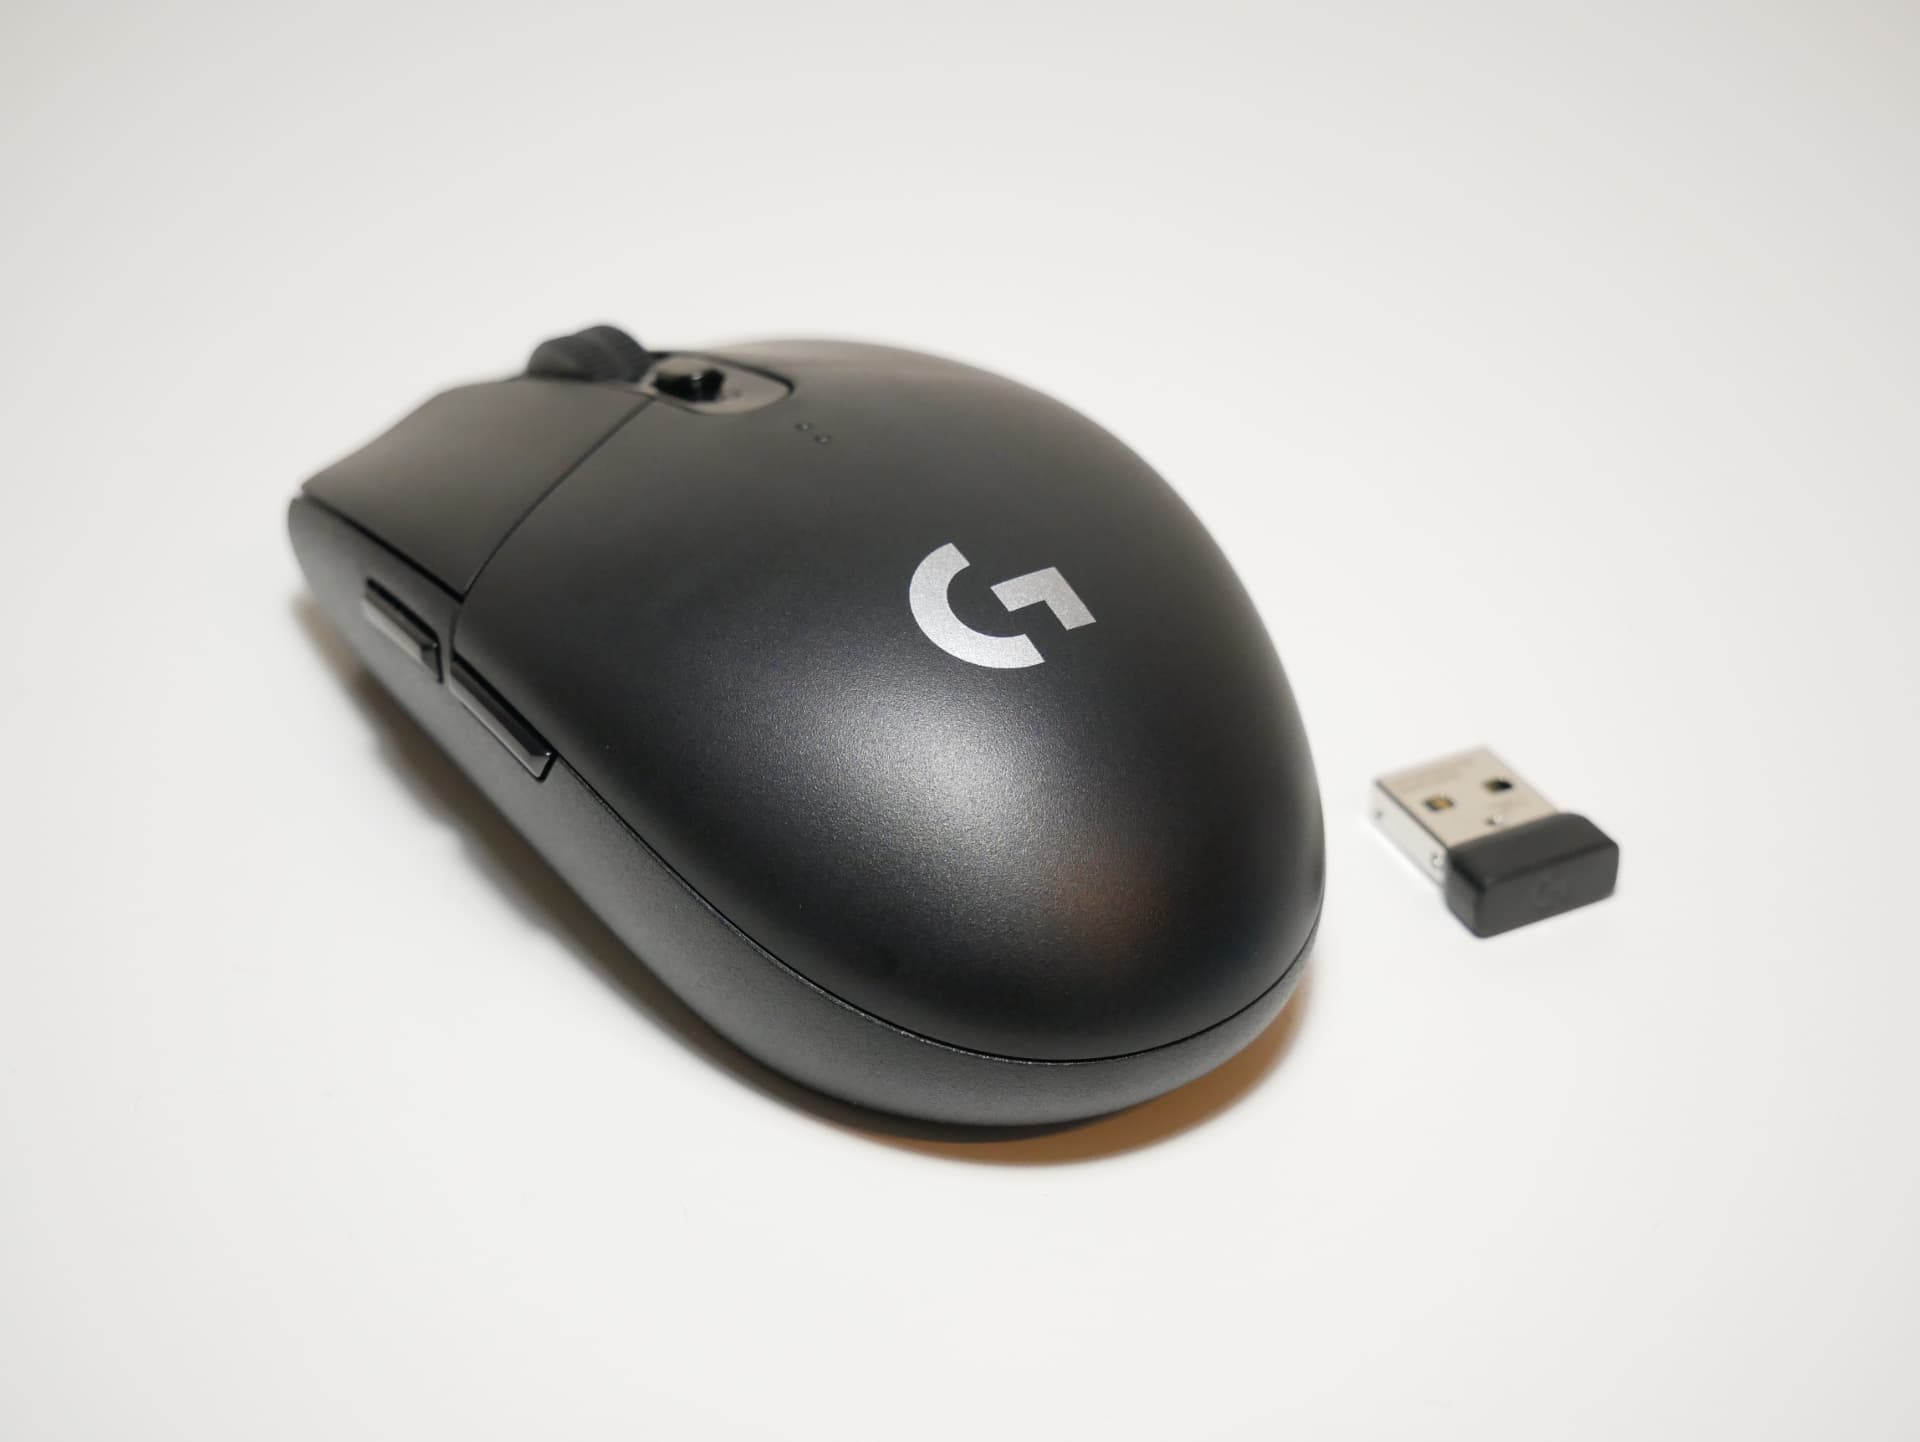 「Logicool G304」レビュー。短所はありつつもコスパ溢れる無線ゲーミングマウス